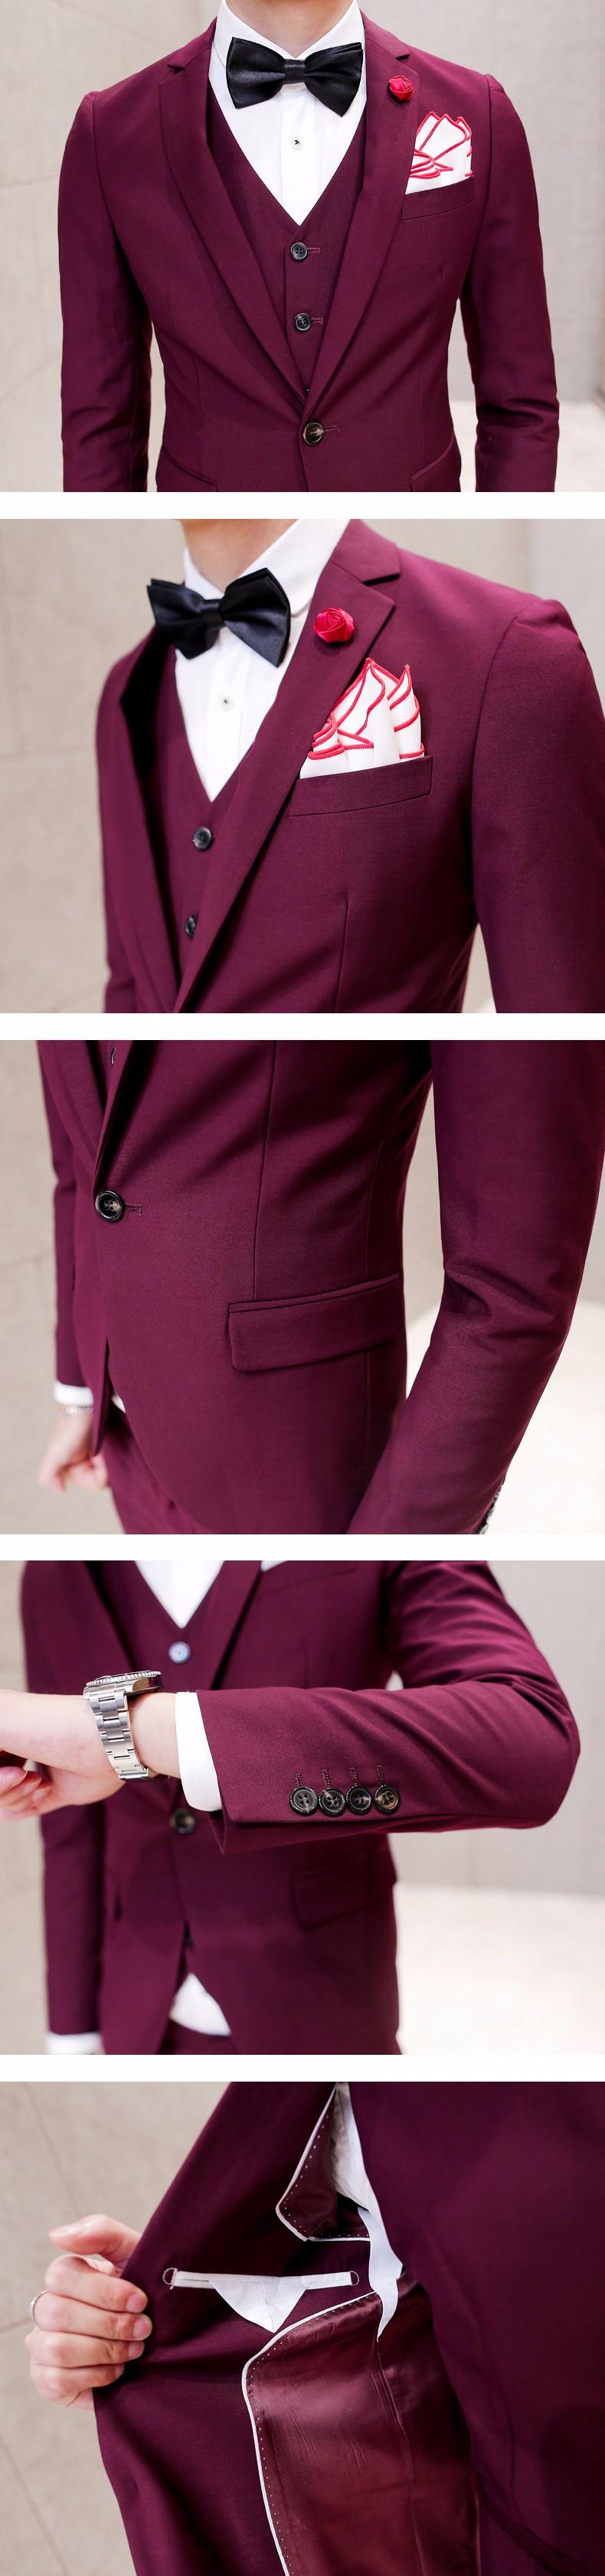 burgundy suit mens